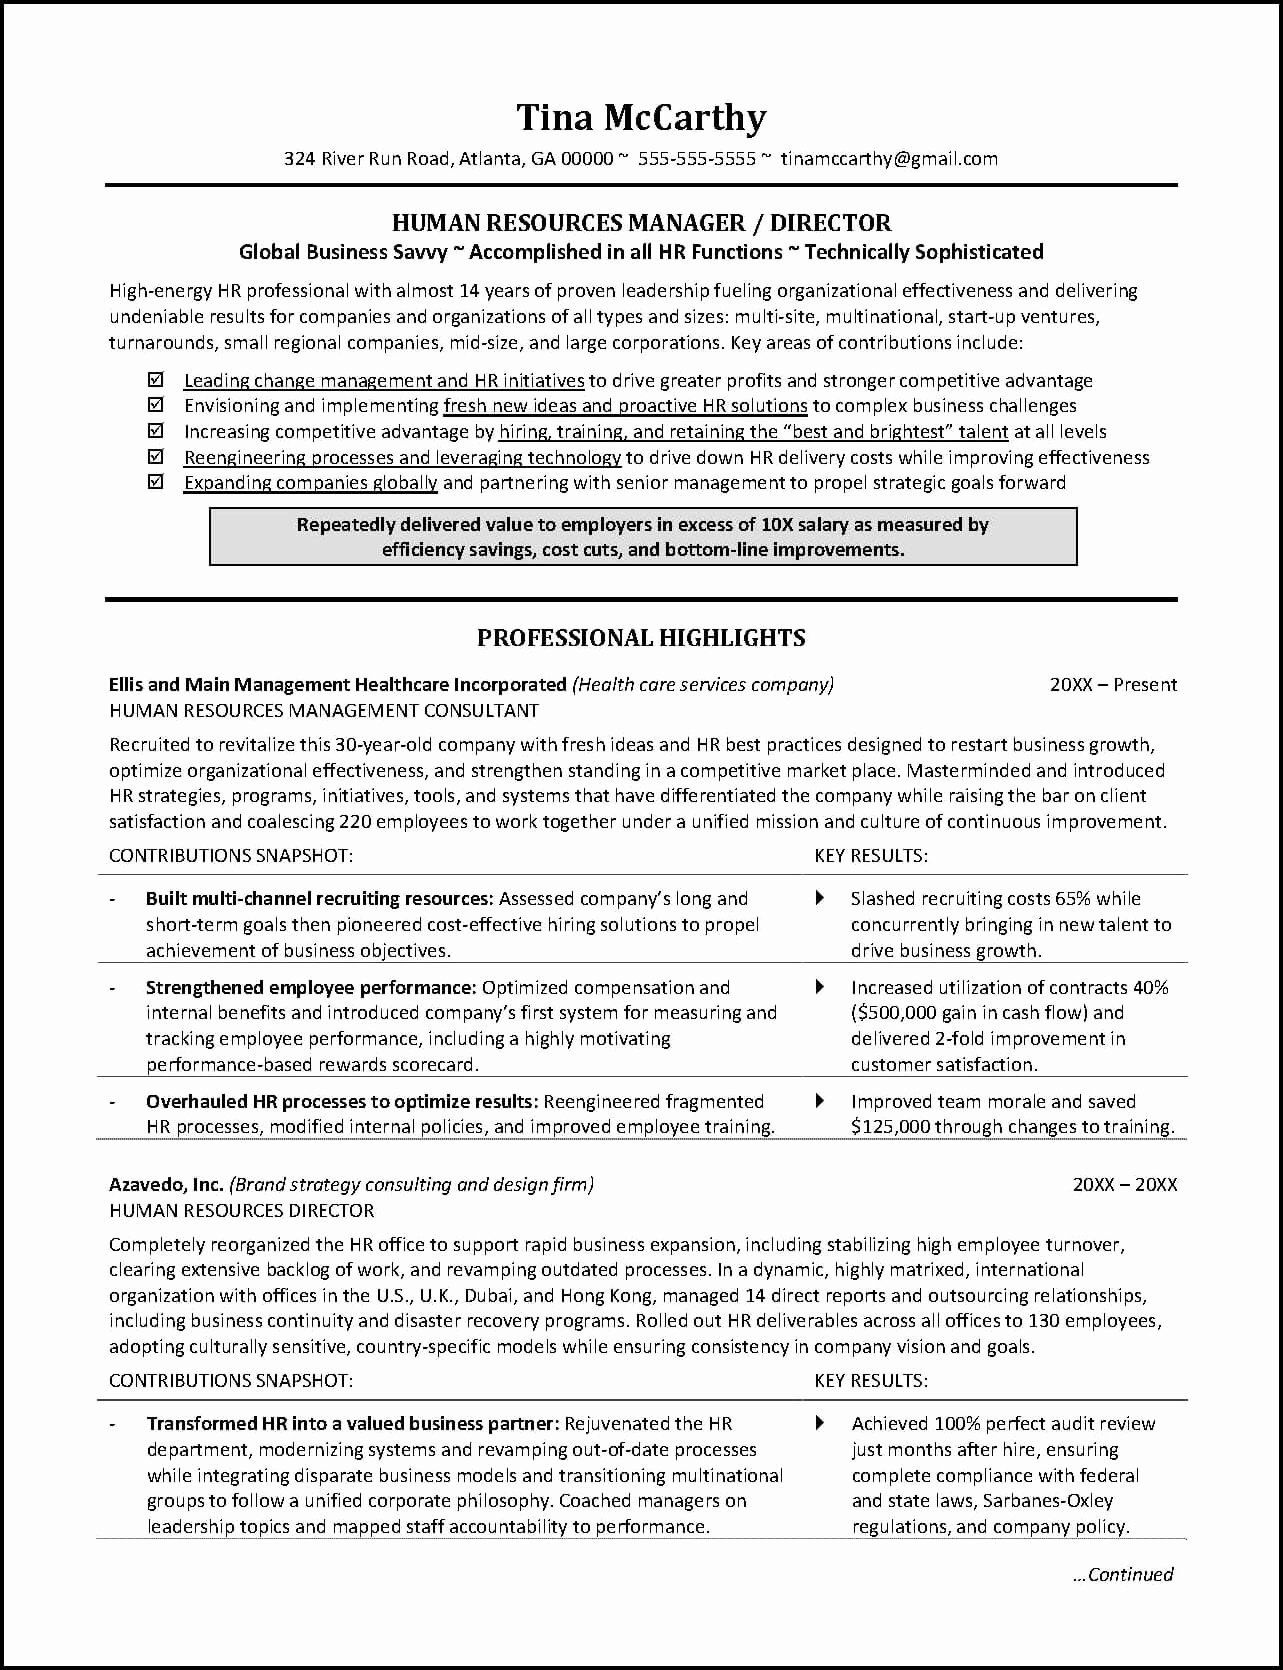 special education teacher interview essay